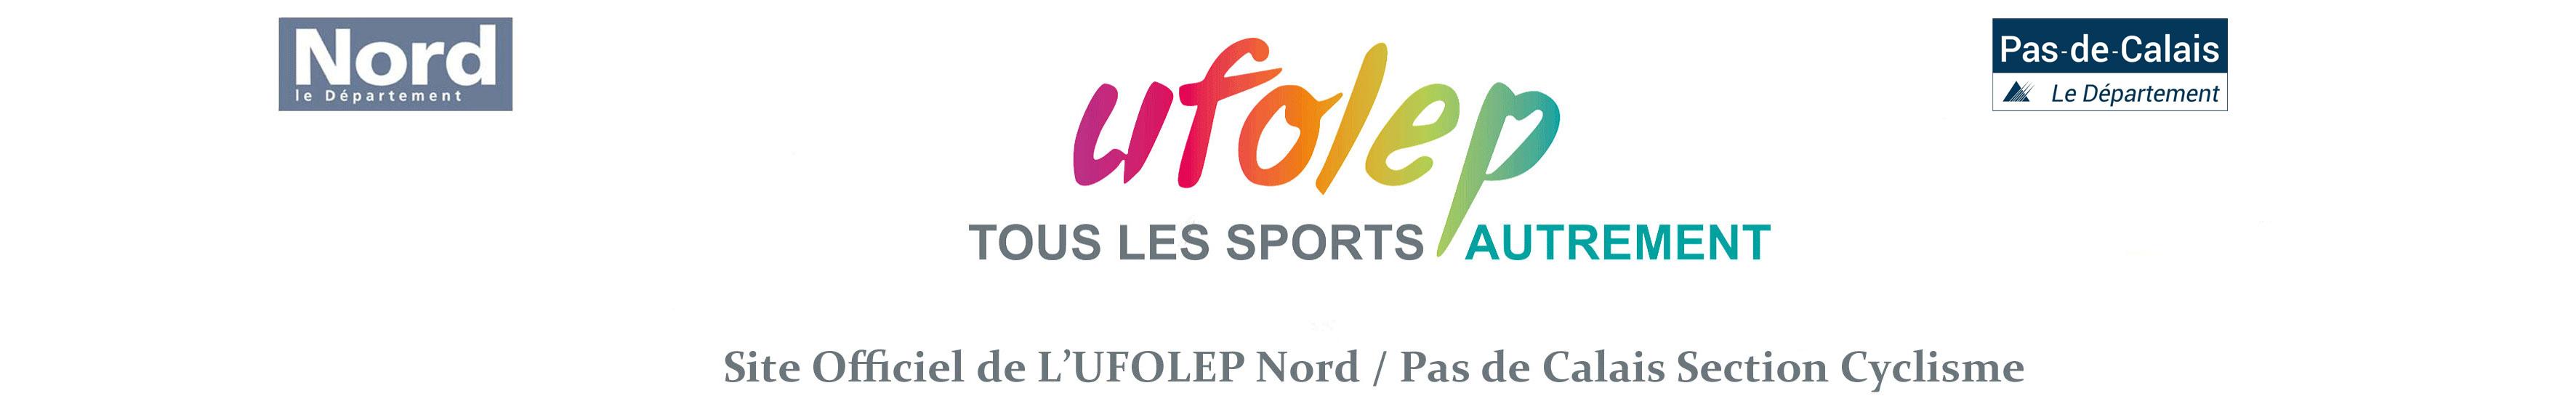 Cyclisme UFOLEP 59/62